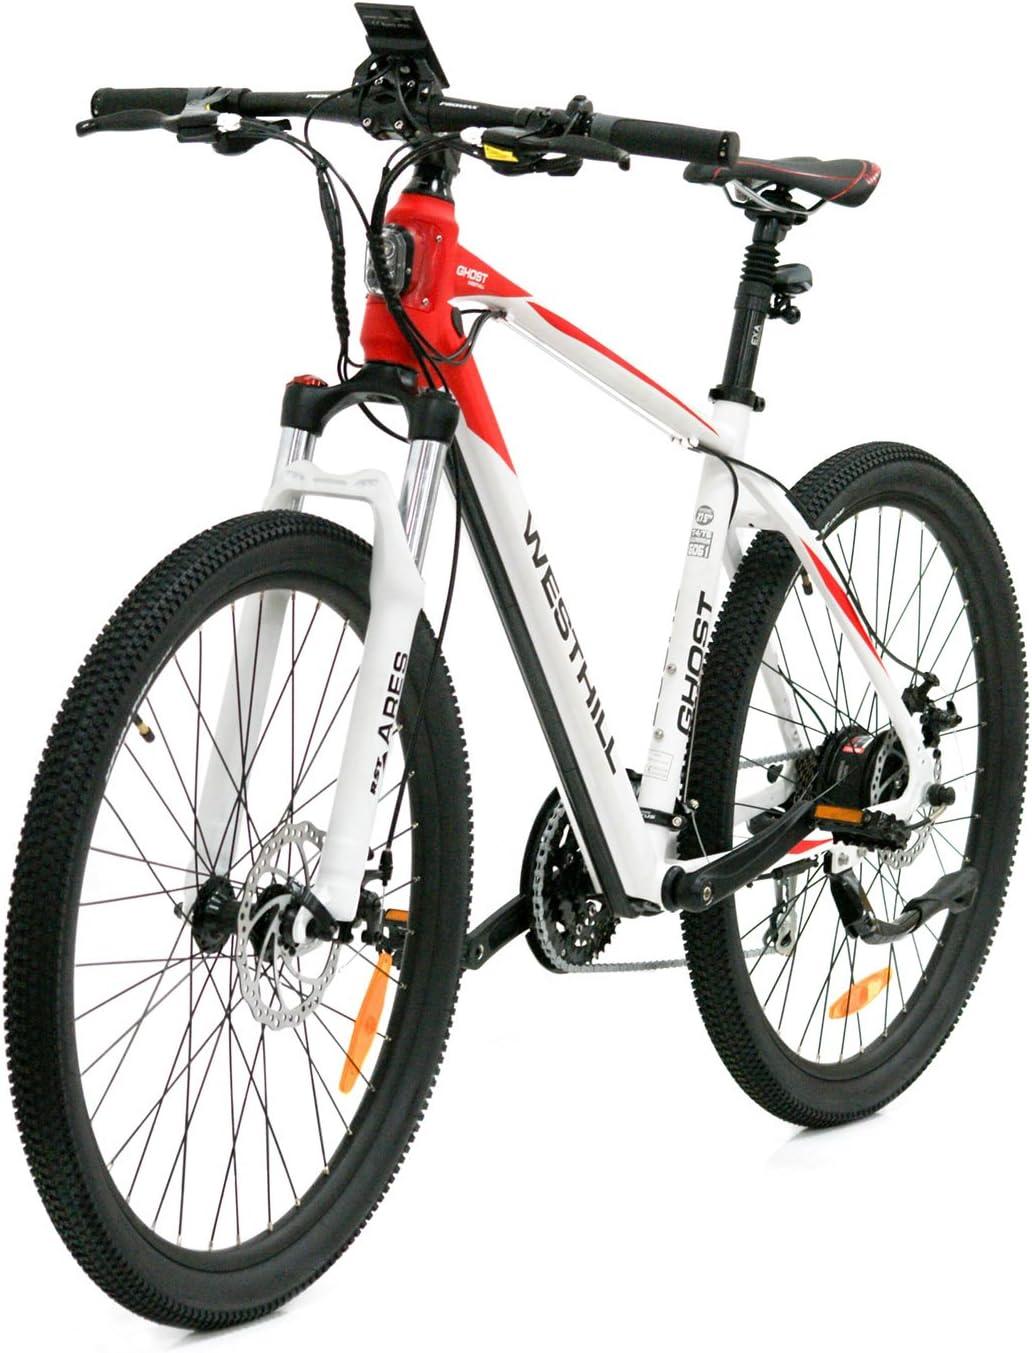 West Hill Ghost - Bicicleta de montaña eléctrica - Batería de ion ...